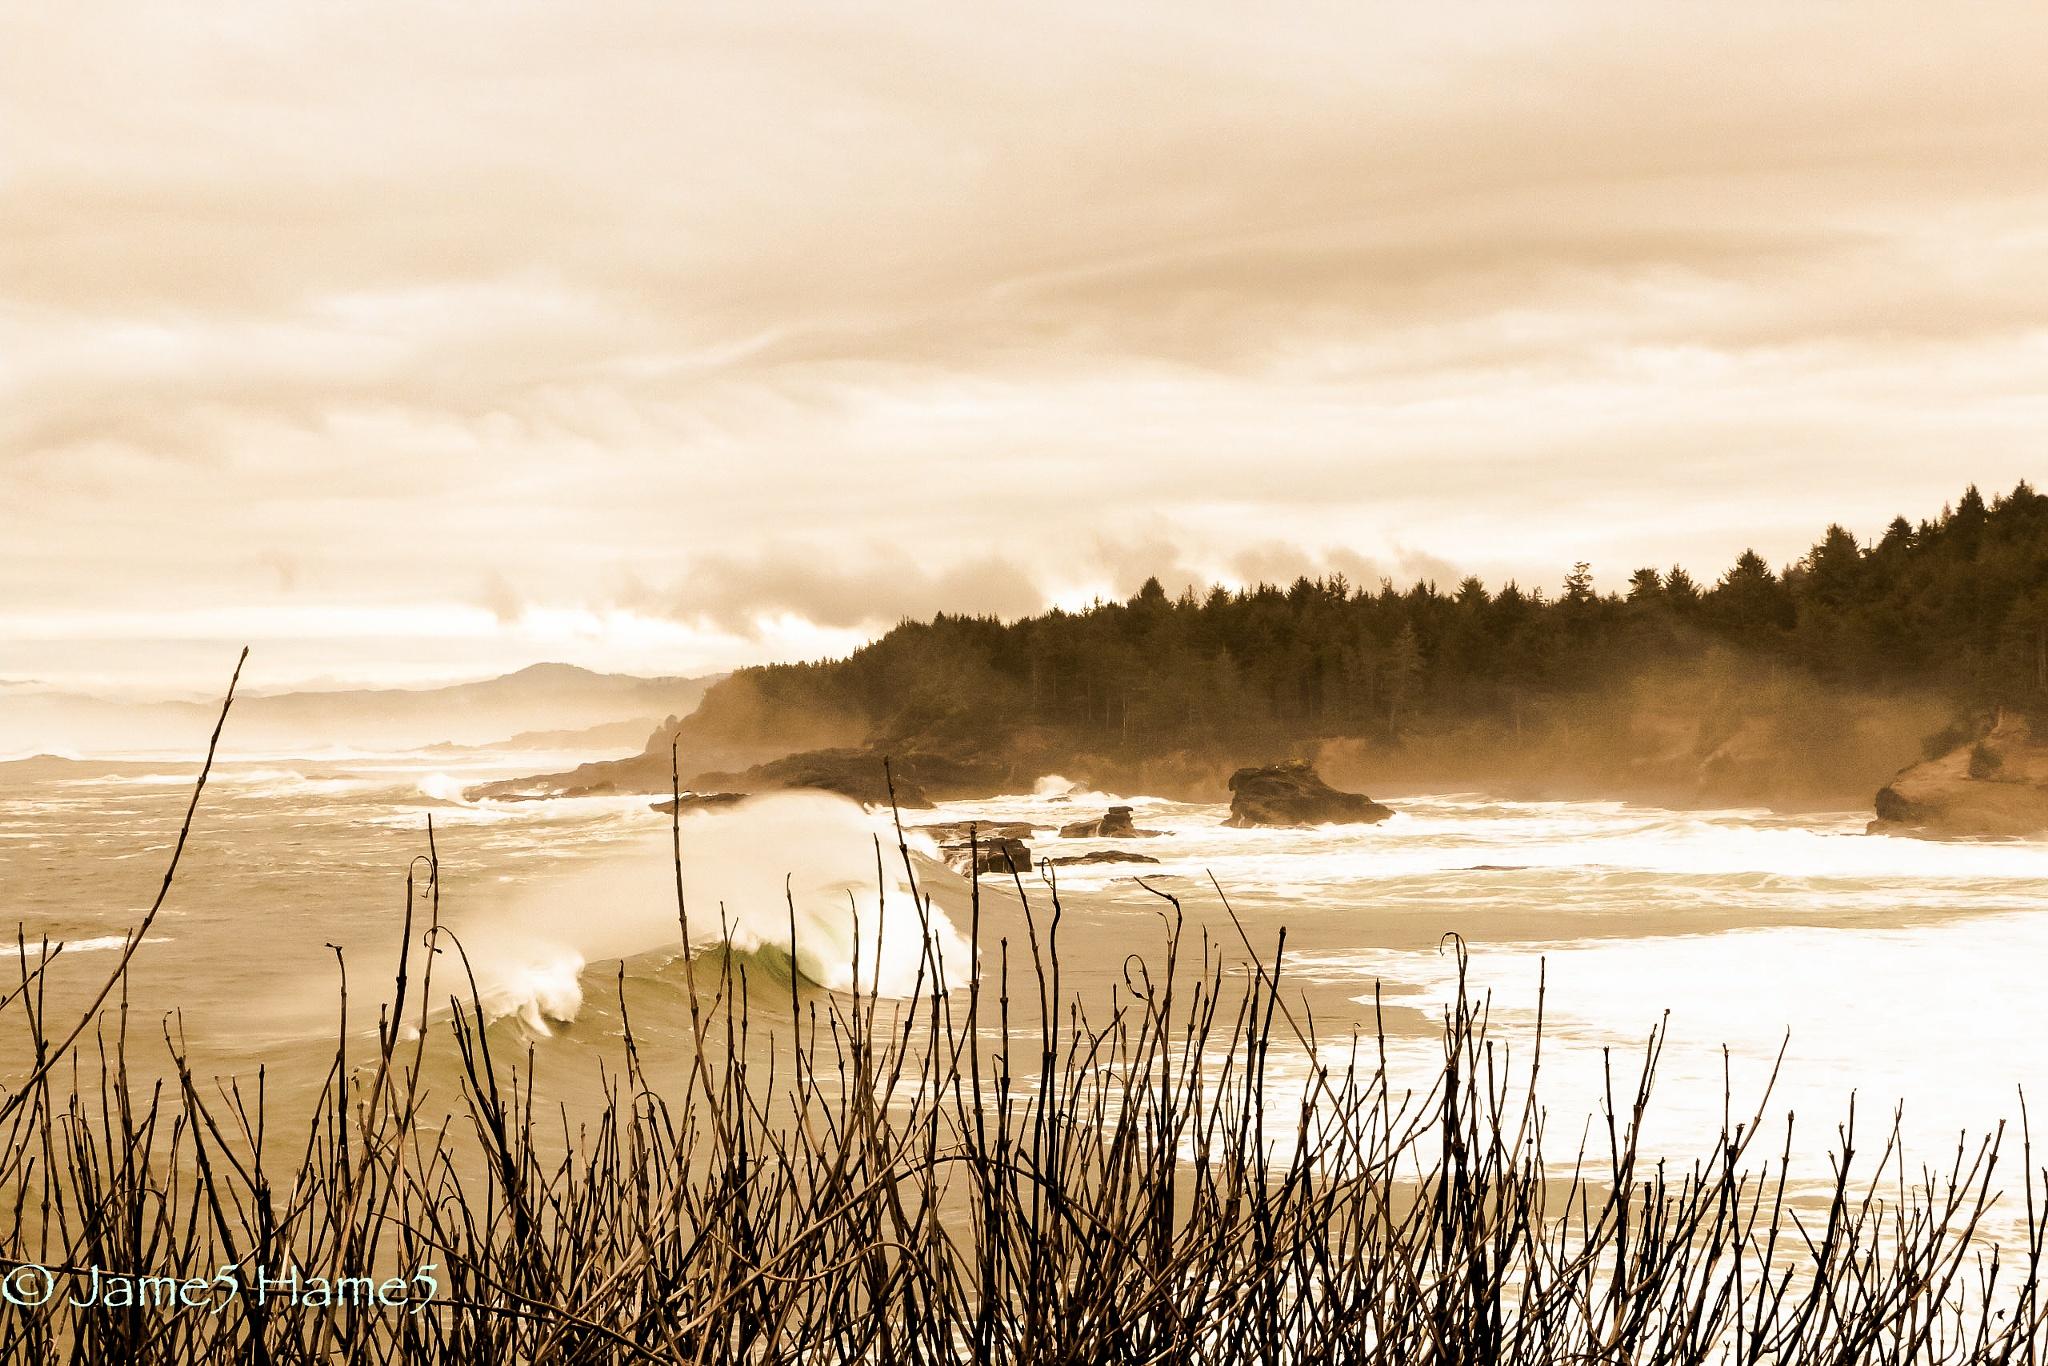 Forgotten Tides by Jimmy James Hames